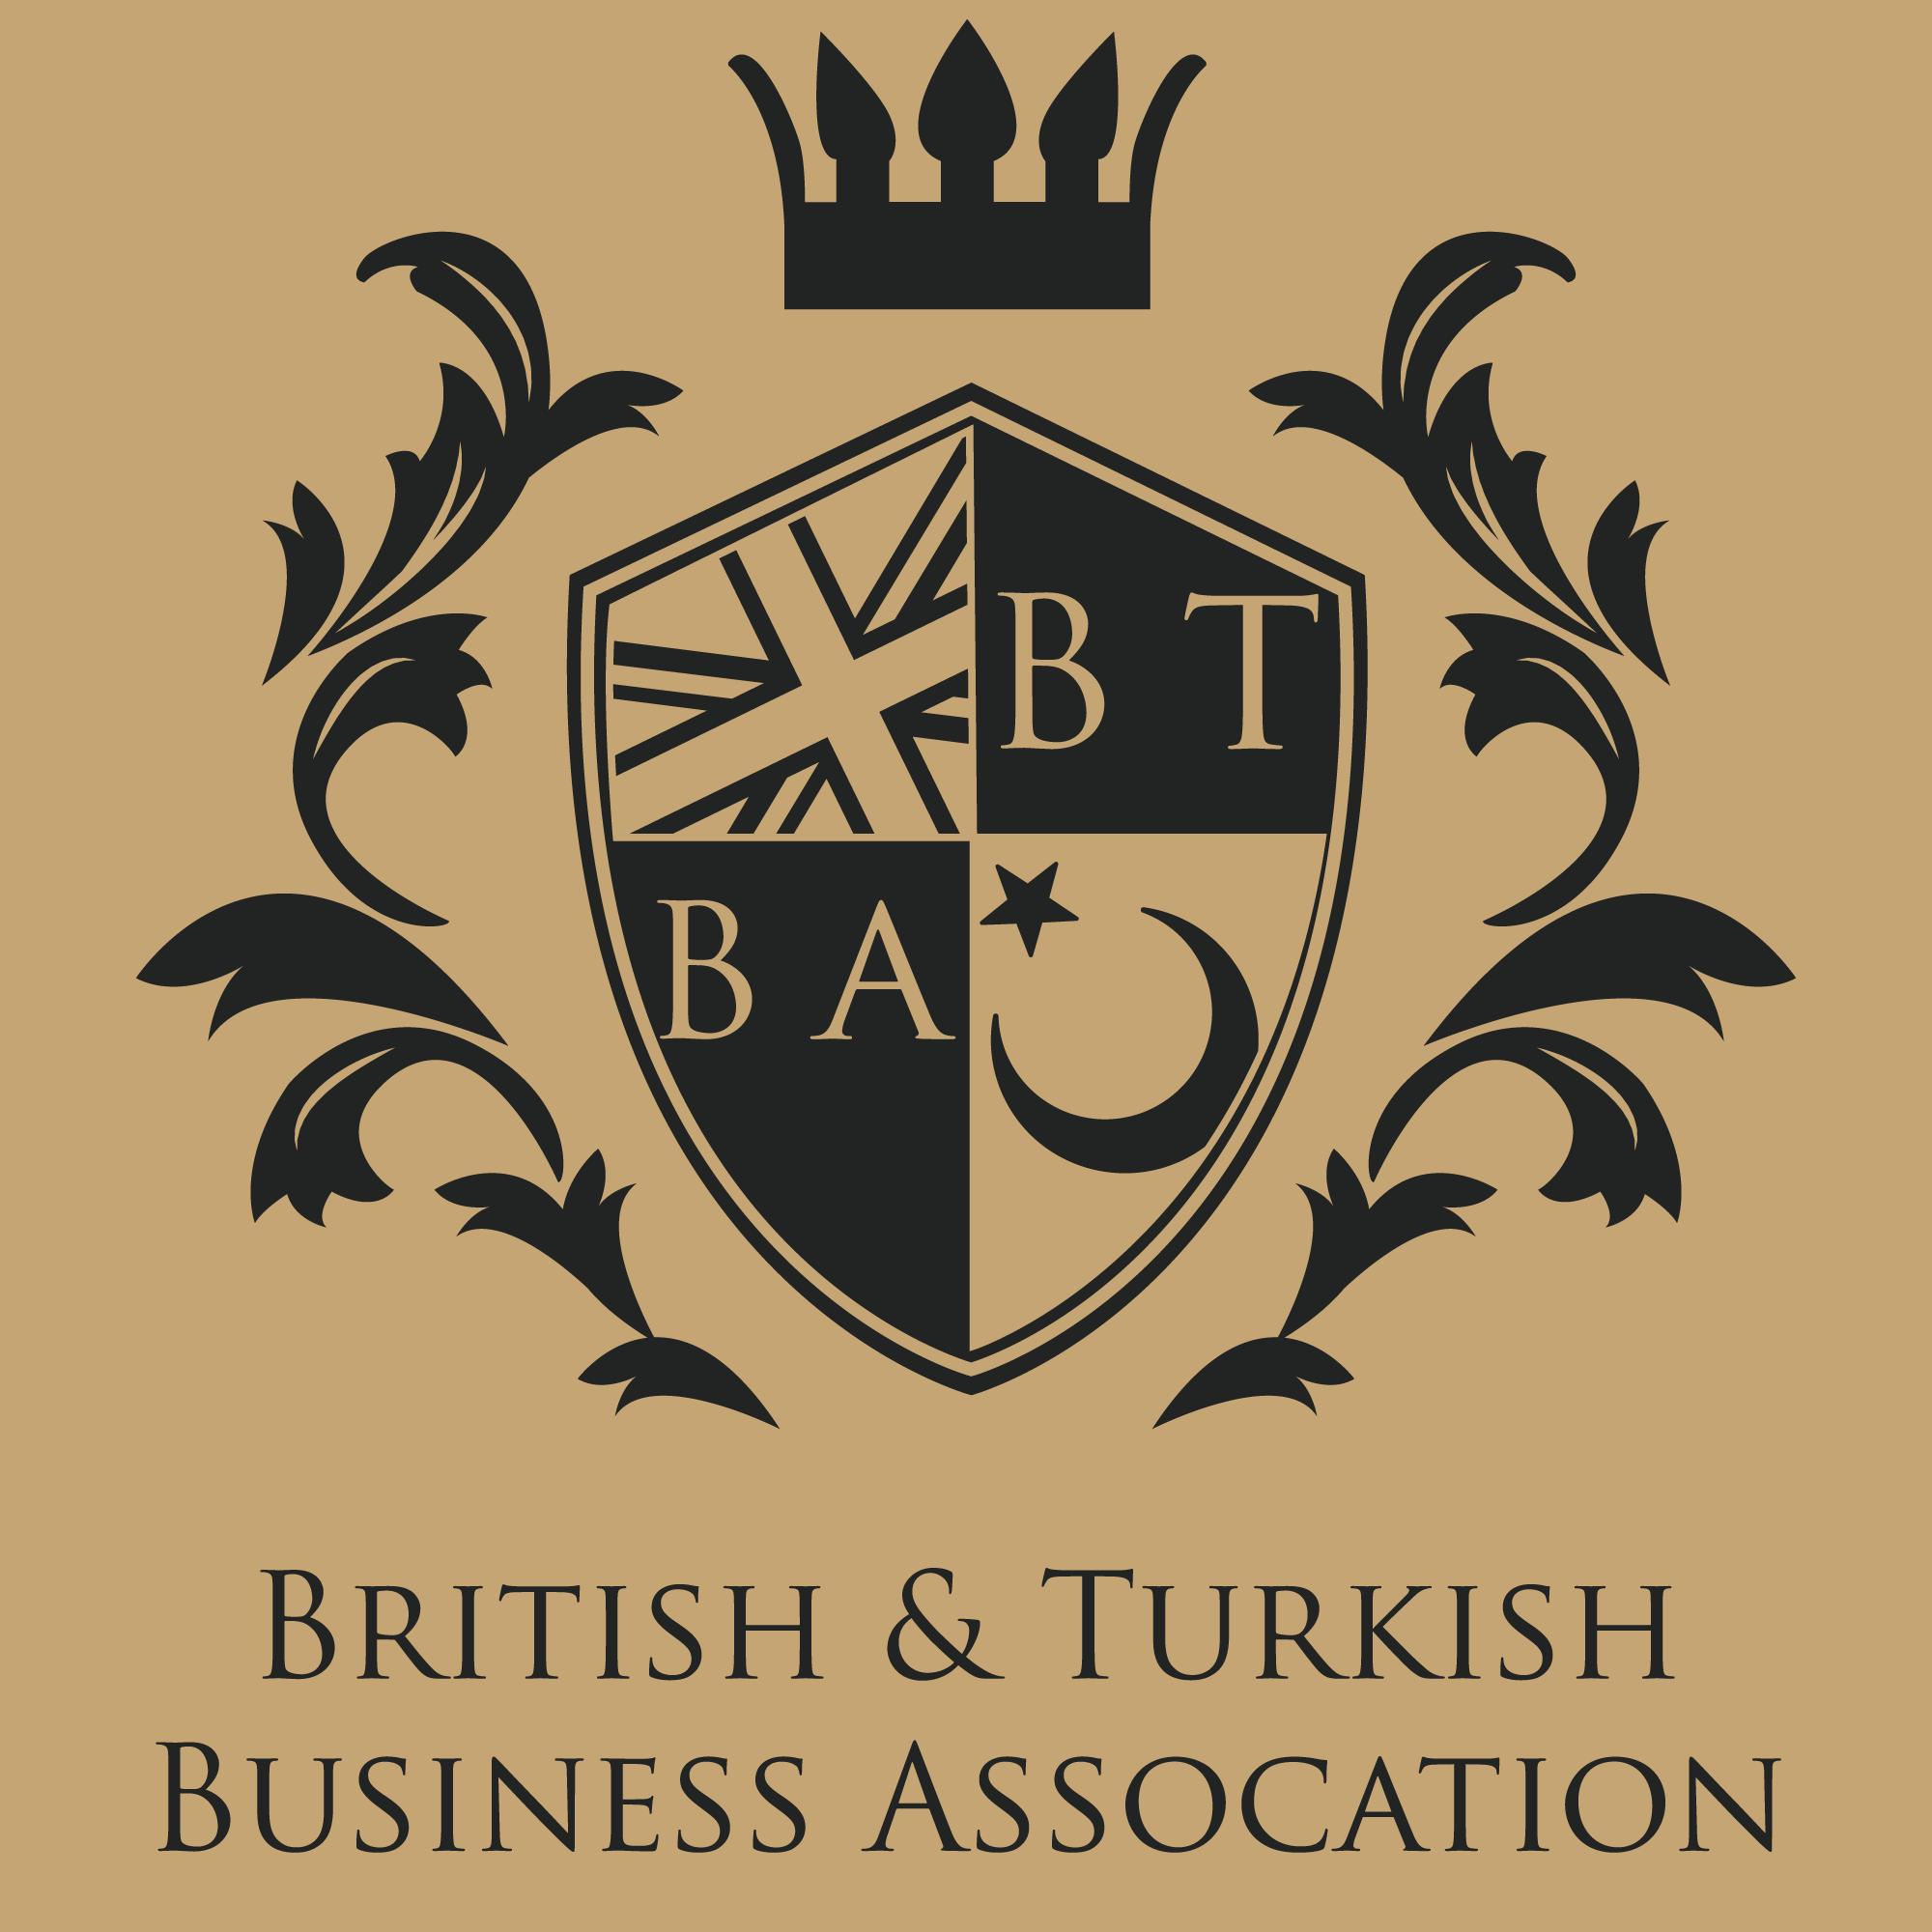 British & Turkish Business Association - Logo - GoldBG